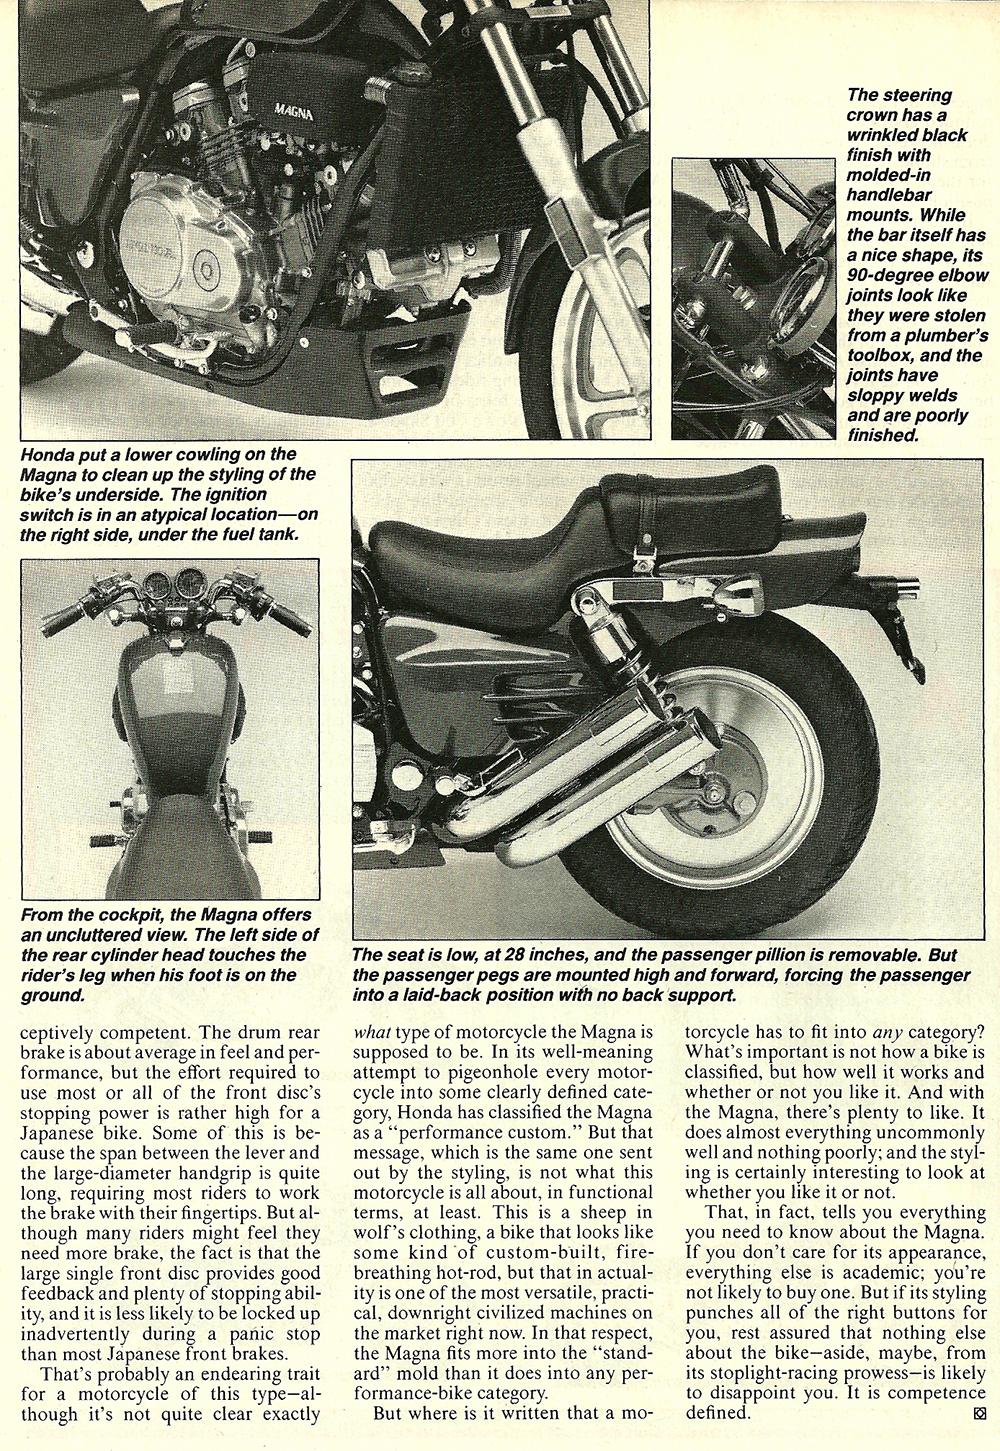 1987 Honda 700 Magna road test 05.jpg